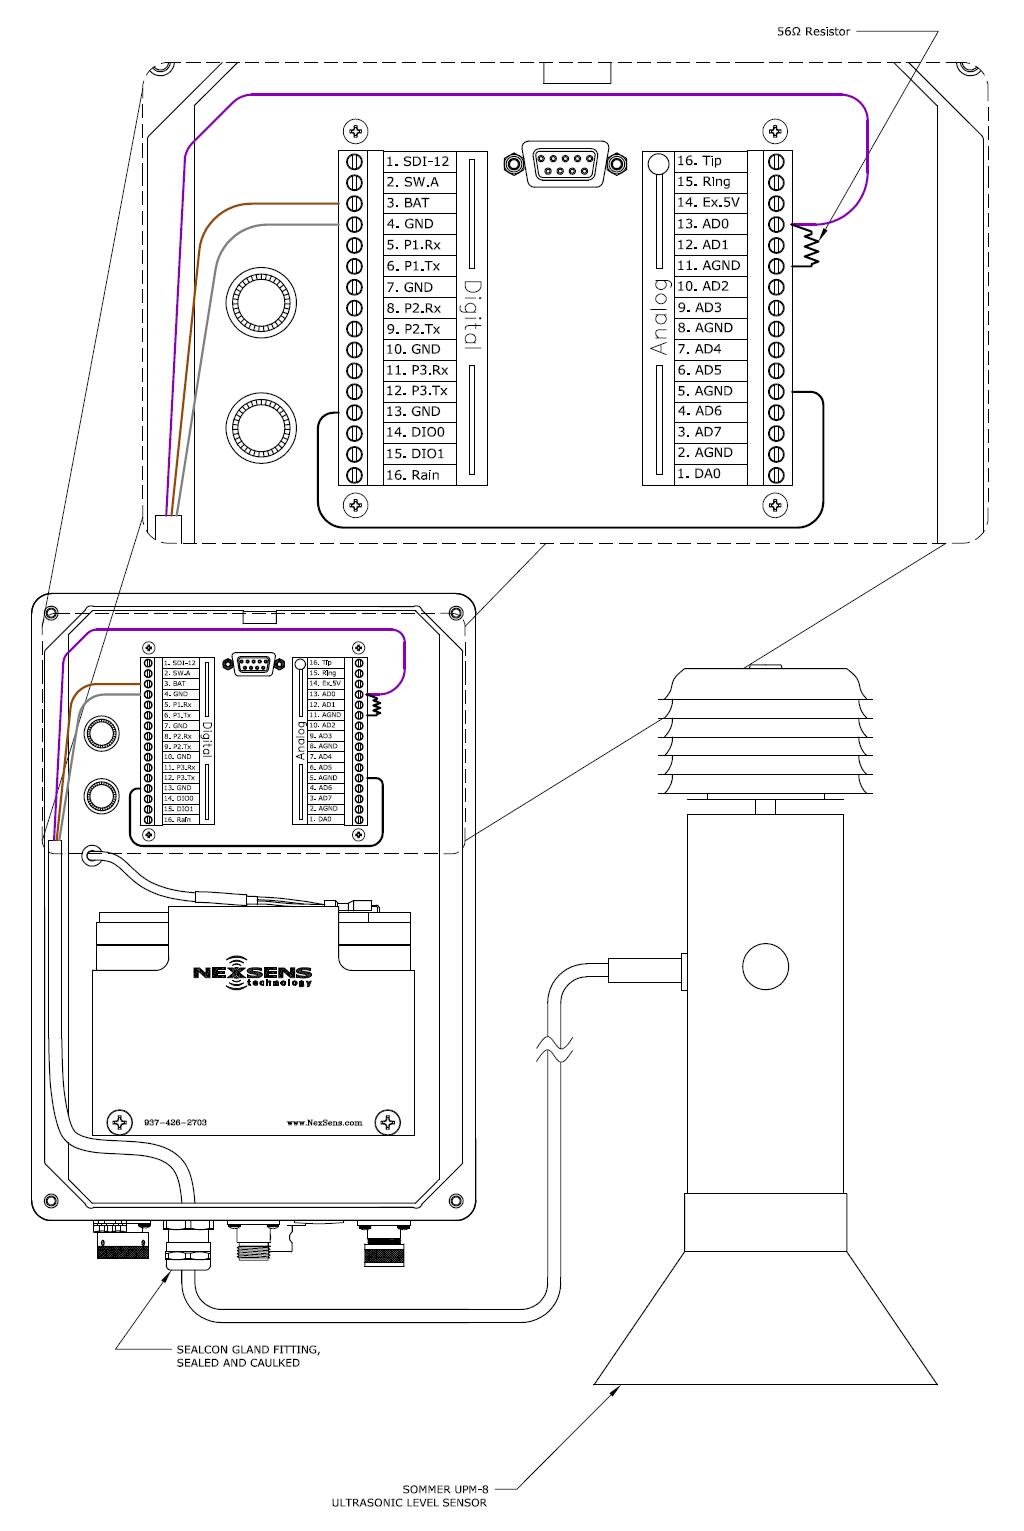 Sommer Upm 8 Ultrasonic Level Sensor Nexsens Technology Inc Figure 3 A Completed Rain Detector Circuit 1 Wiring An Into Isic Data Logger